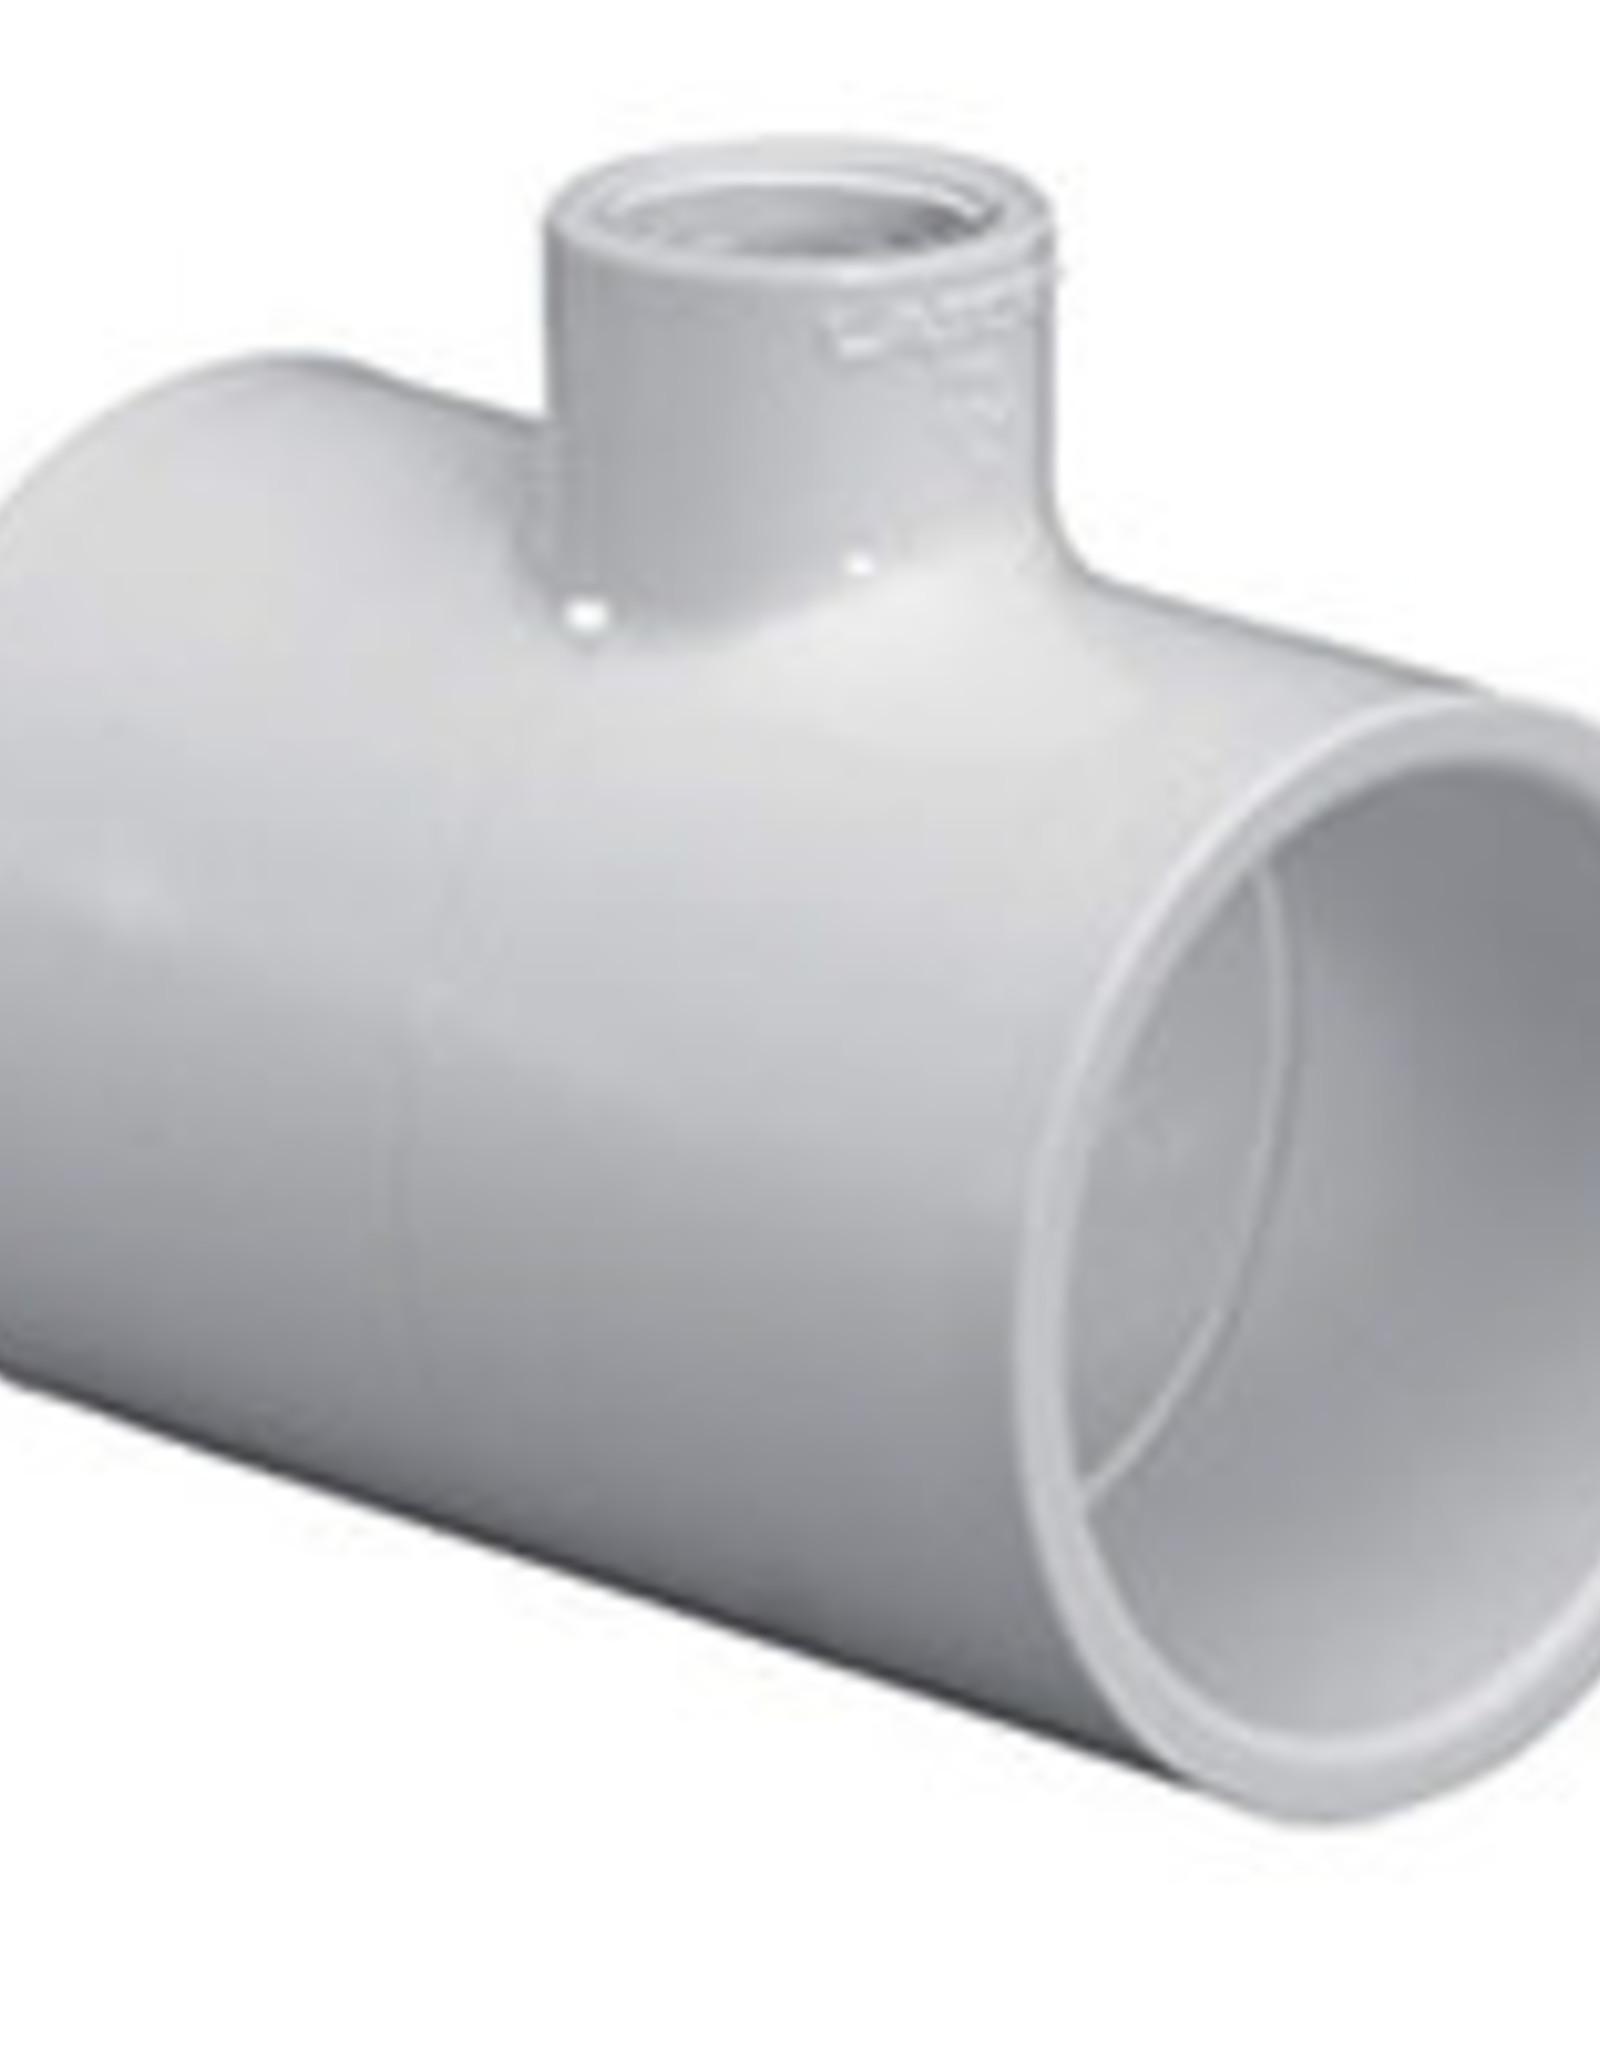 "Lasco Fittings PVC 1"" Reducing Tee Slip x Slip x 1/2"" Slip"